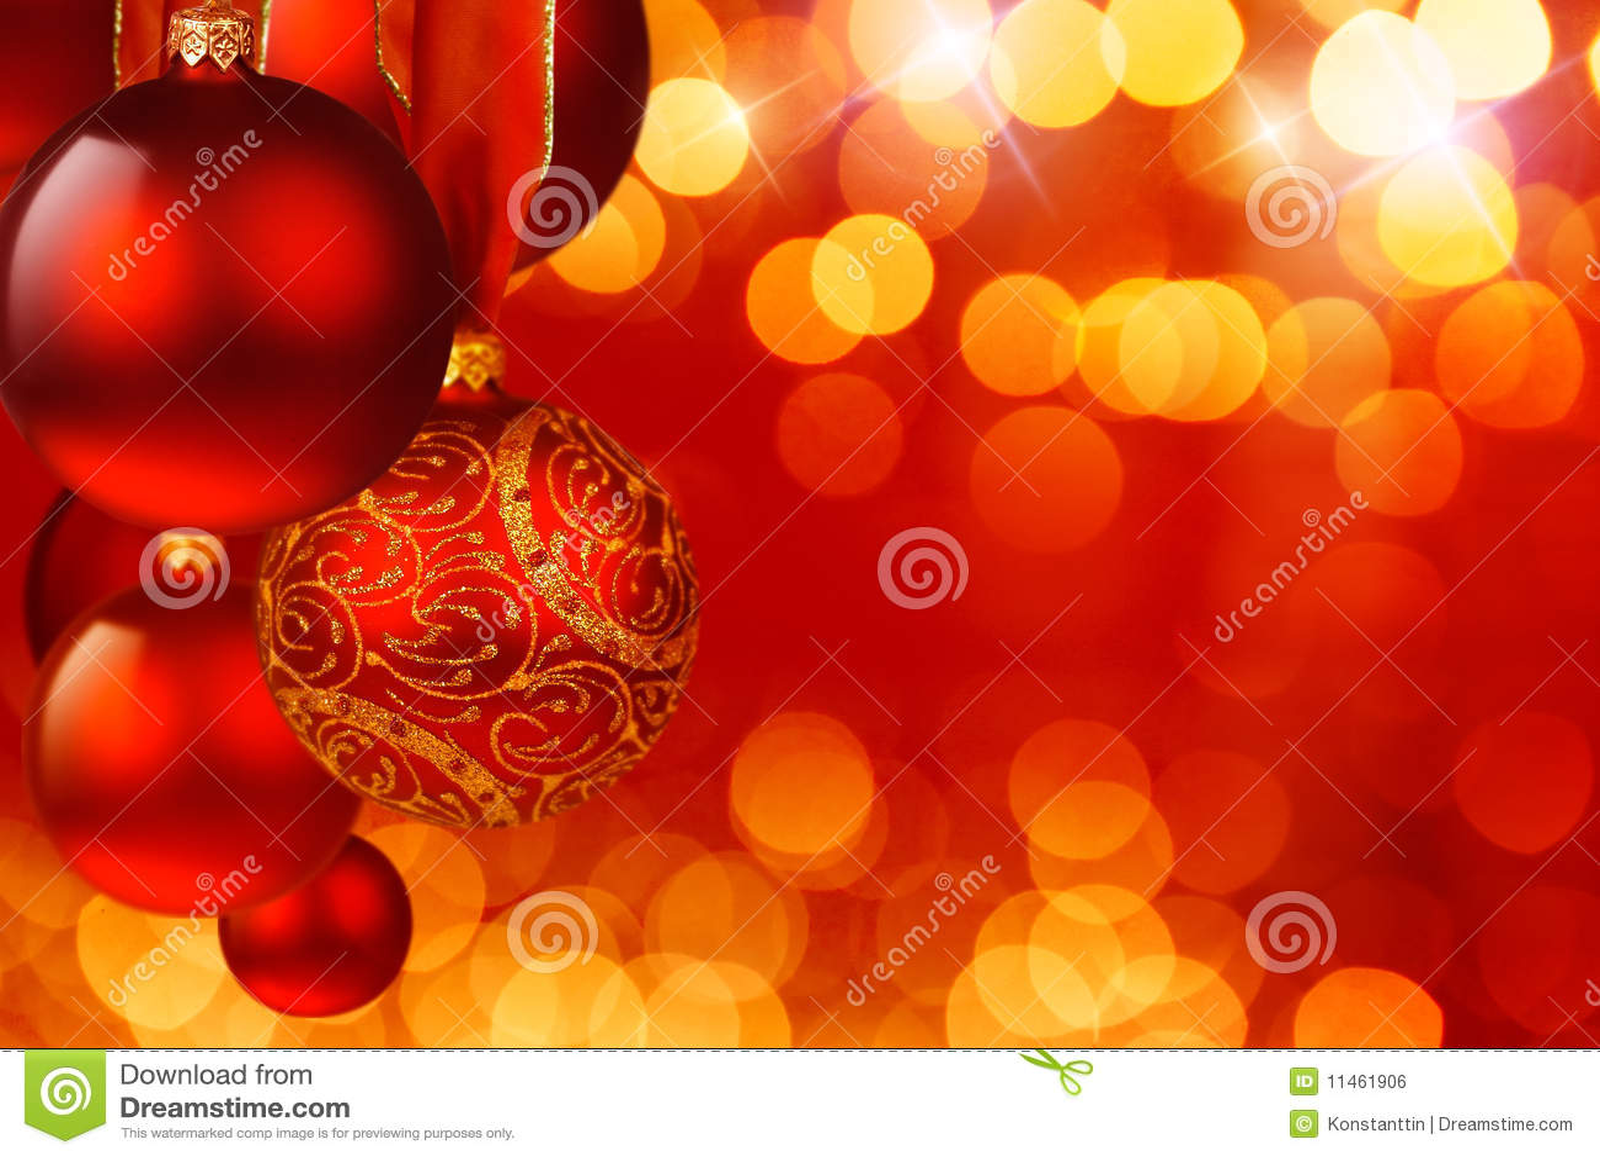 weihnachtskugeln lizenzfreies stockbild bild 11461906. Black Bedroom Furniture Sets. Home Design Ideas